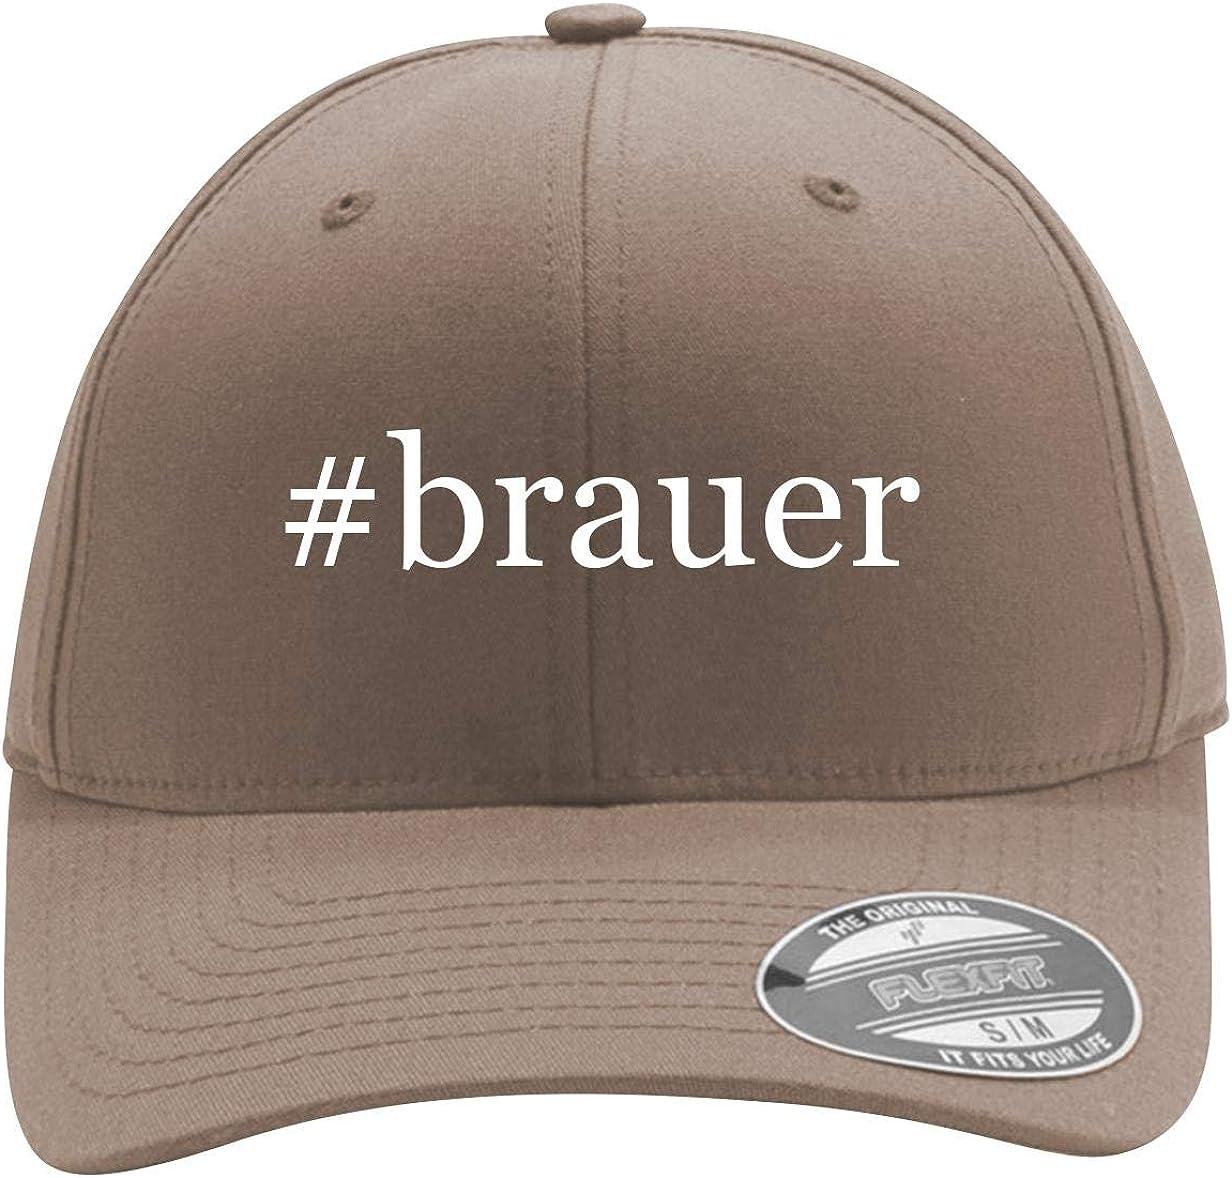 #Brauer - Men's Hashtag Flexfit Baseball Cap Hat 61QjFw14zHL